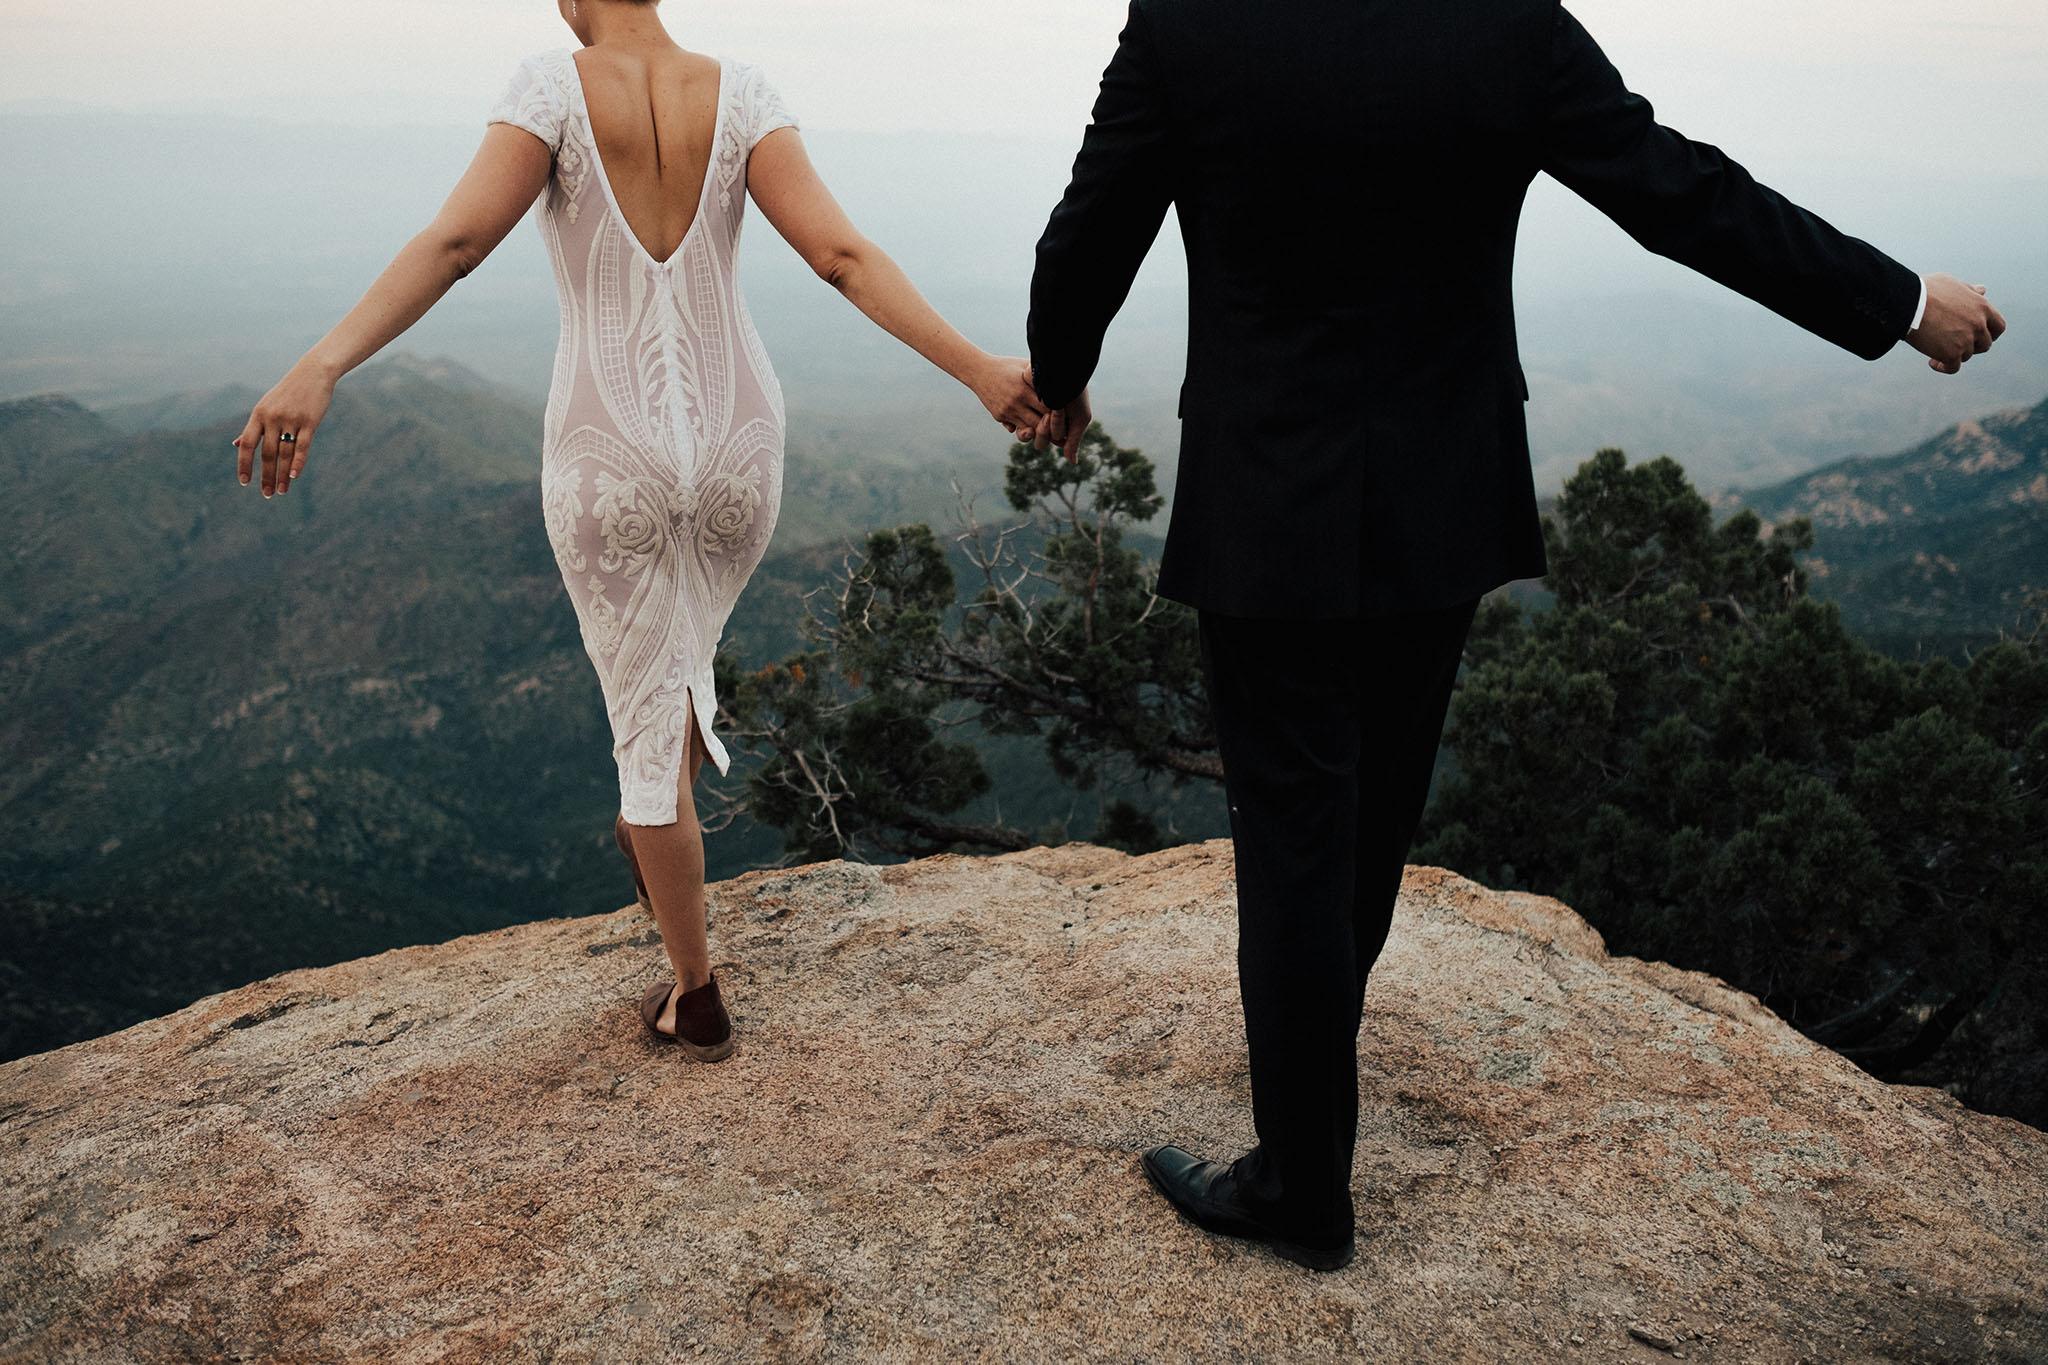 Arizona-Intimate-Elopement-Adventure-Photographer-Mount-Lemmon (38).jpg